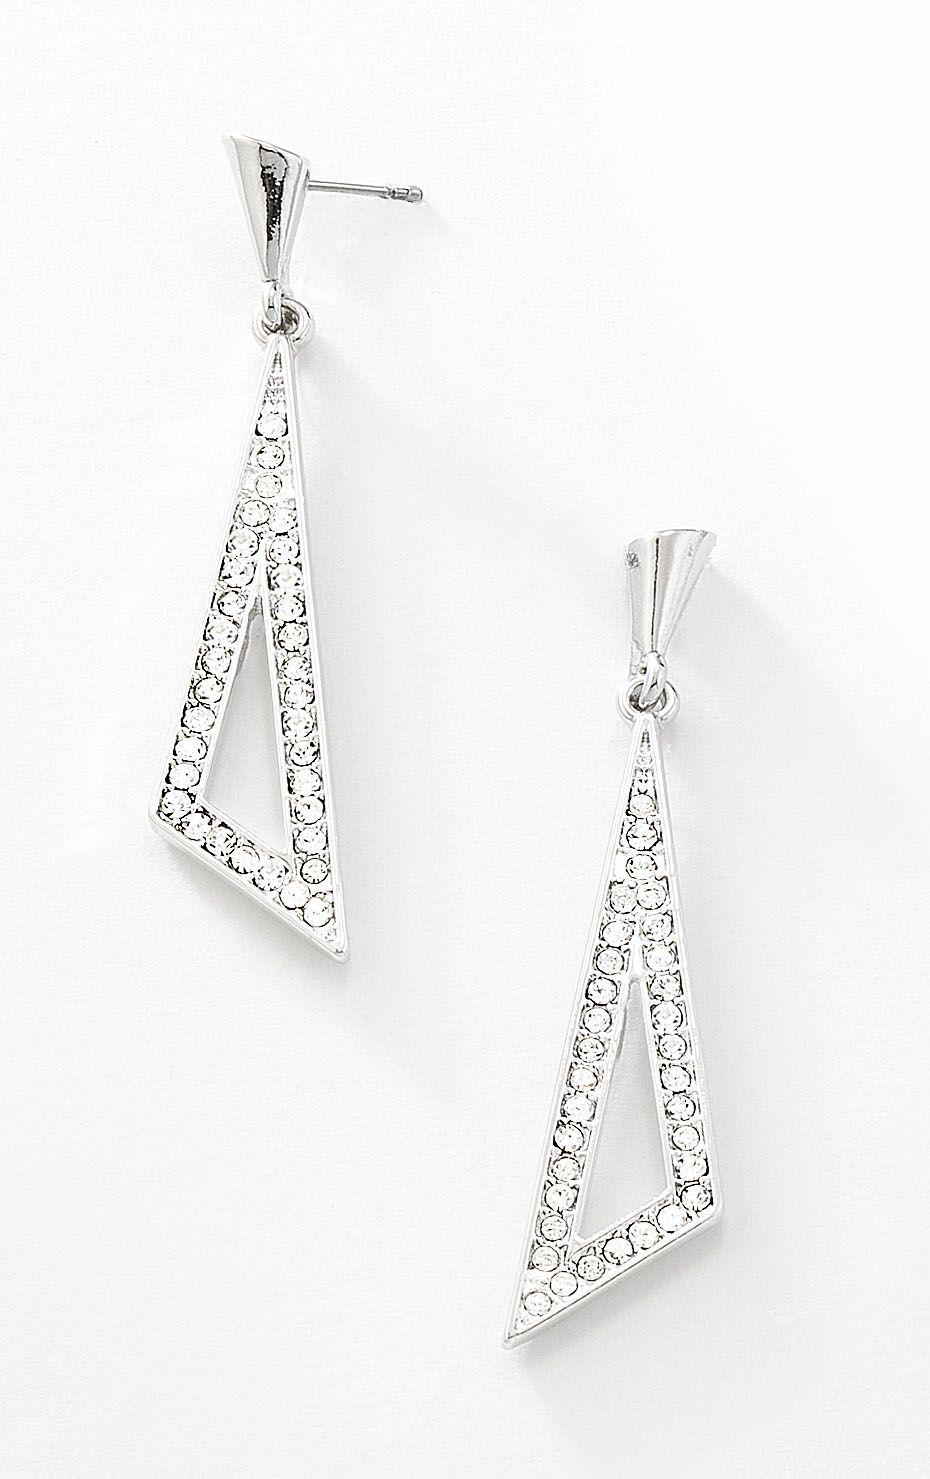 b48276201b8c Hermosos aretes largos triangulares de rodio con piedras de cristal  incrustradas. Modelo 415153.